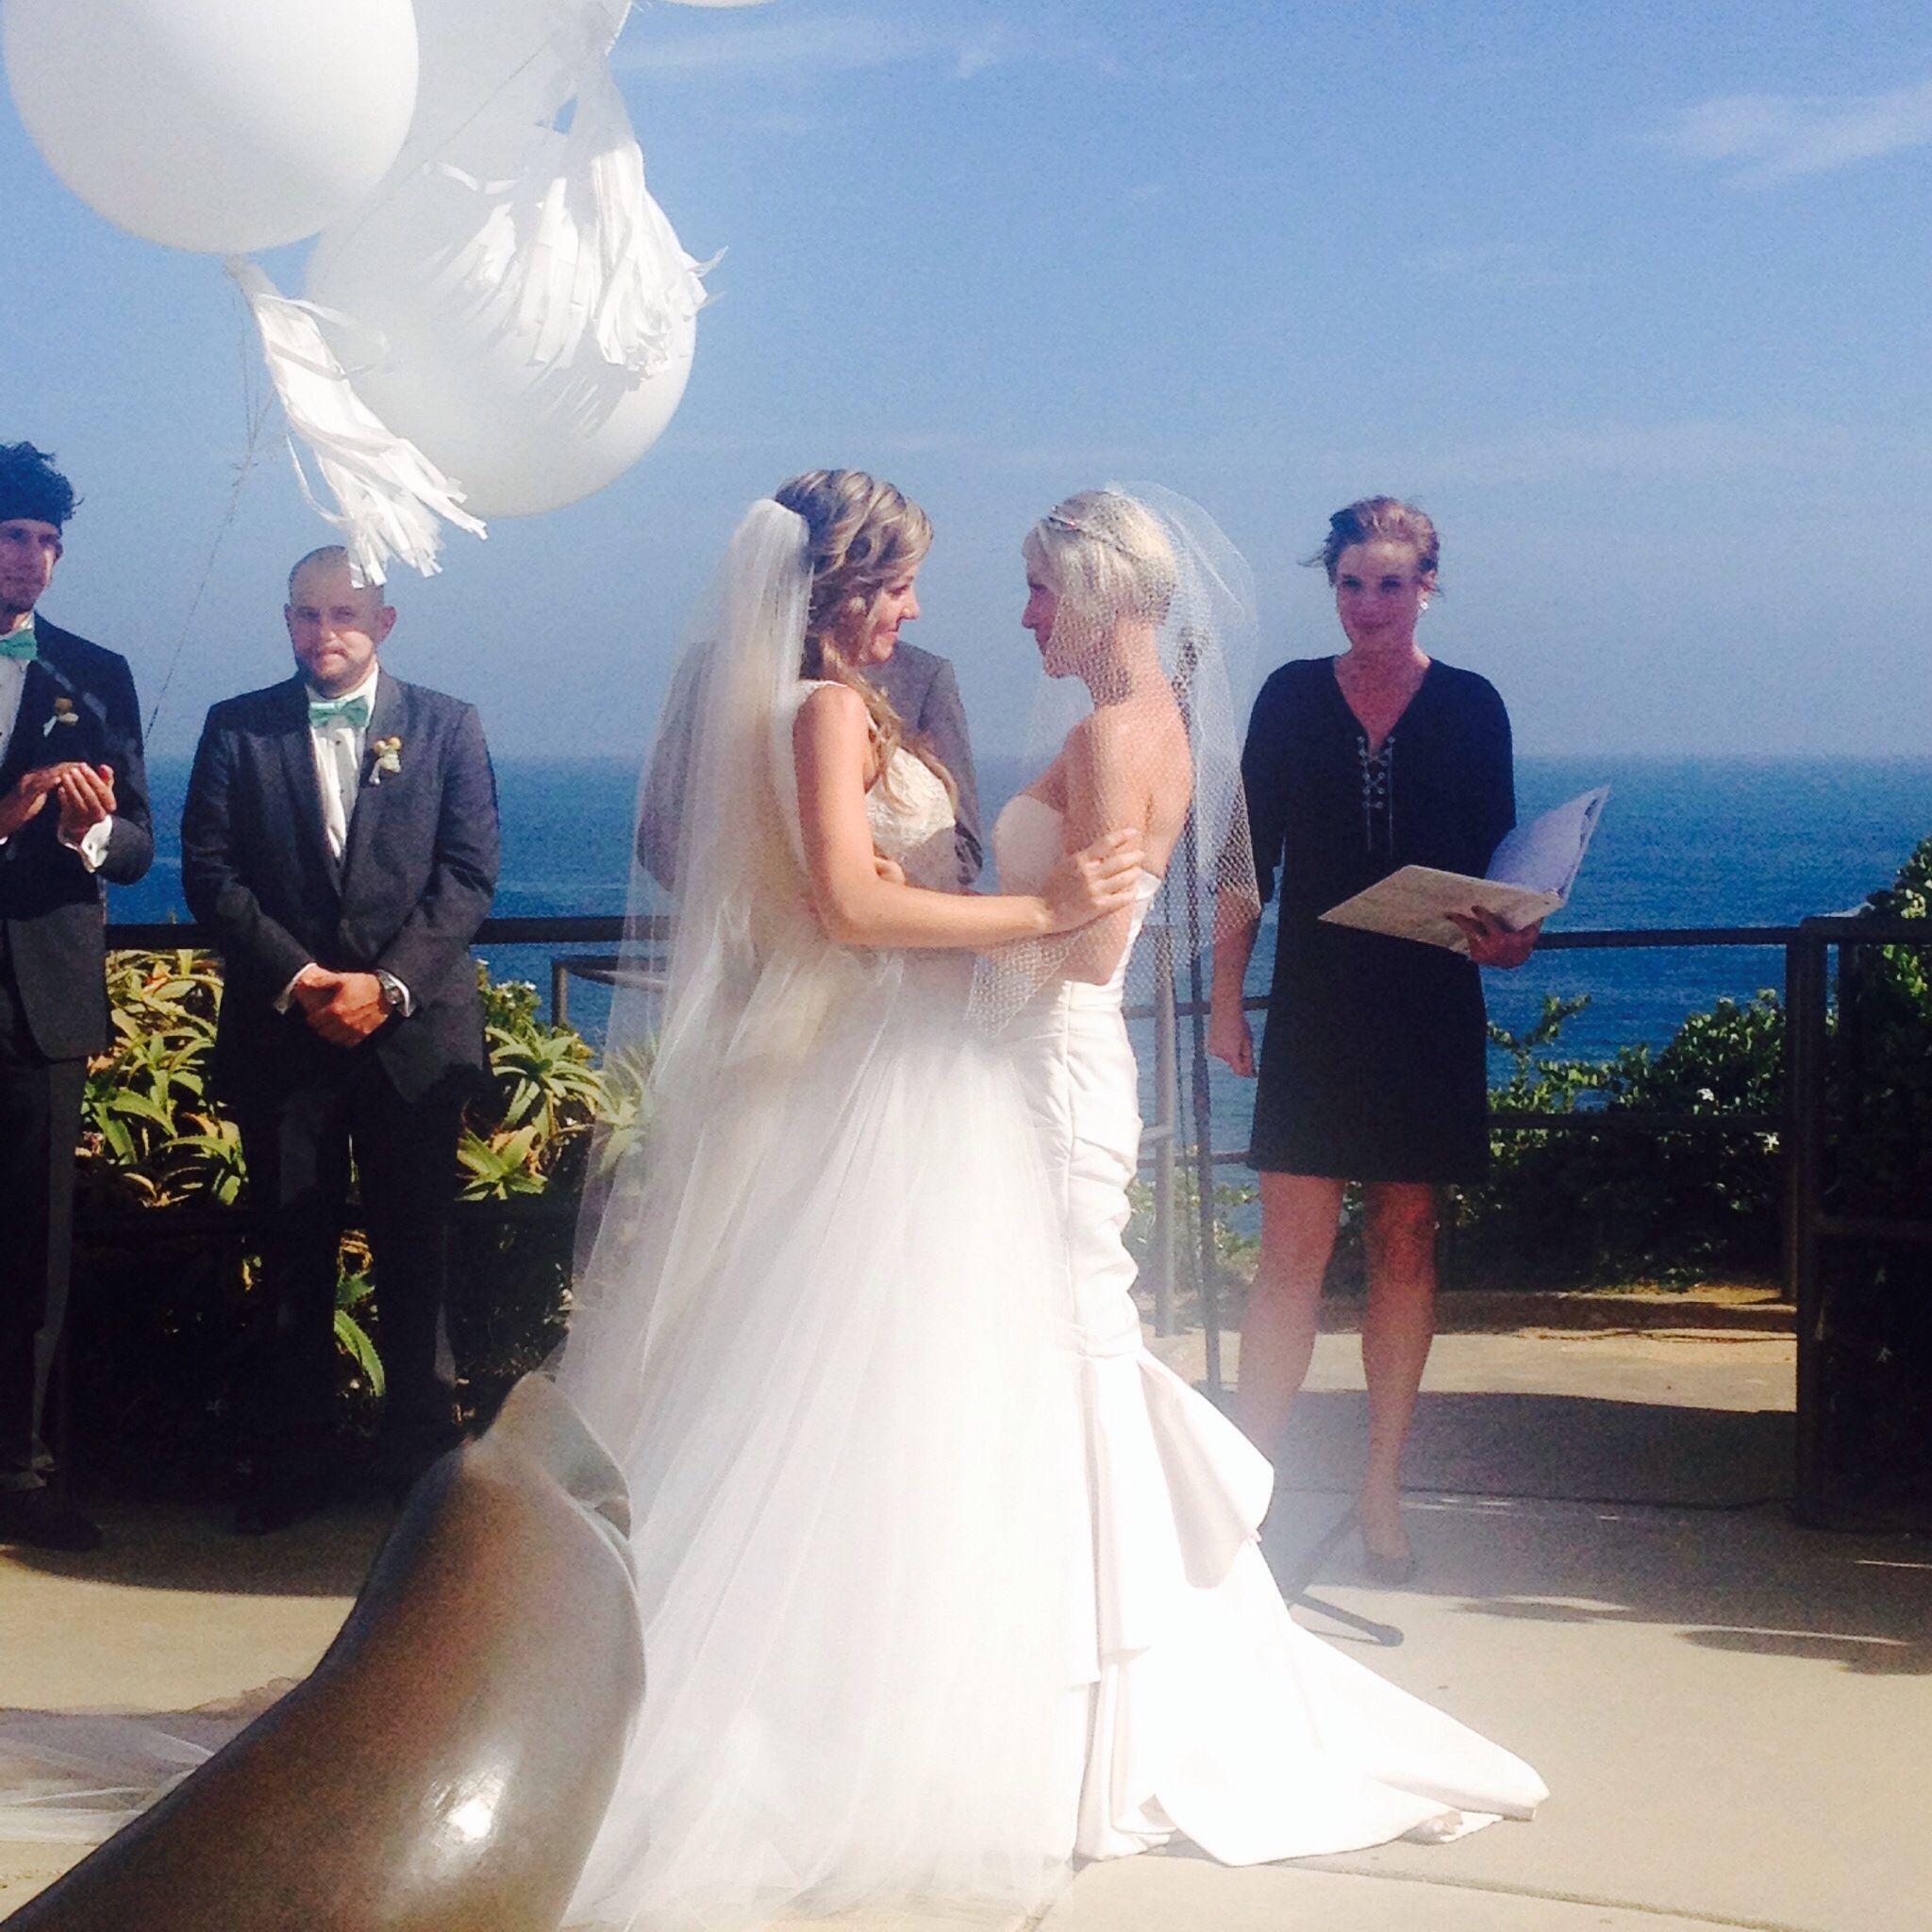 Lesbian Wedding Crescent Bay Park In Laguna Beach Dresses From Erin Cole Designers